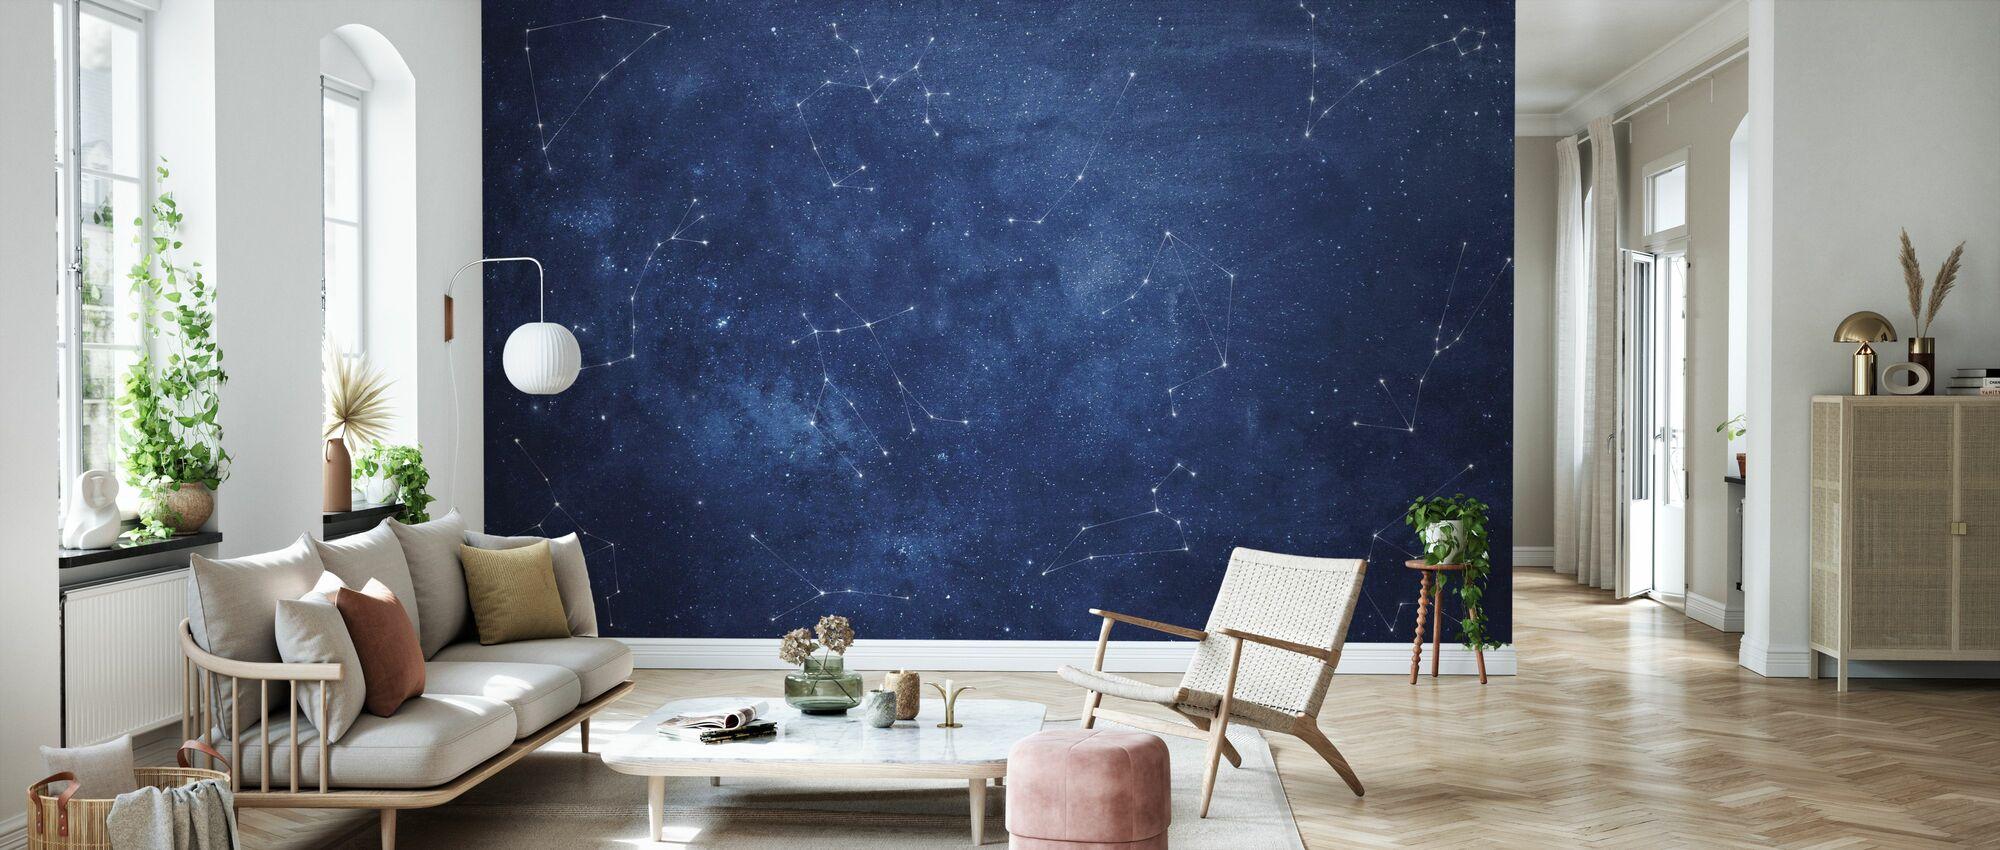 Zoodiac Sky - Wallpaper - Living Room